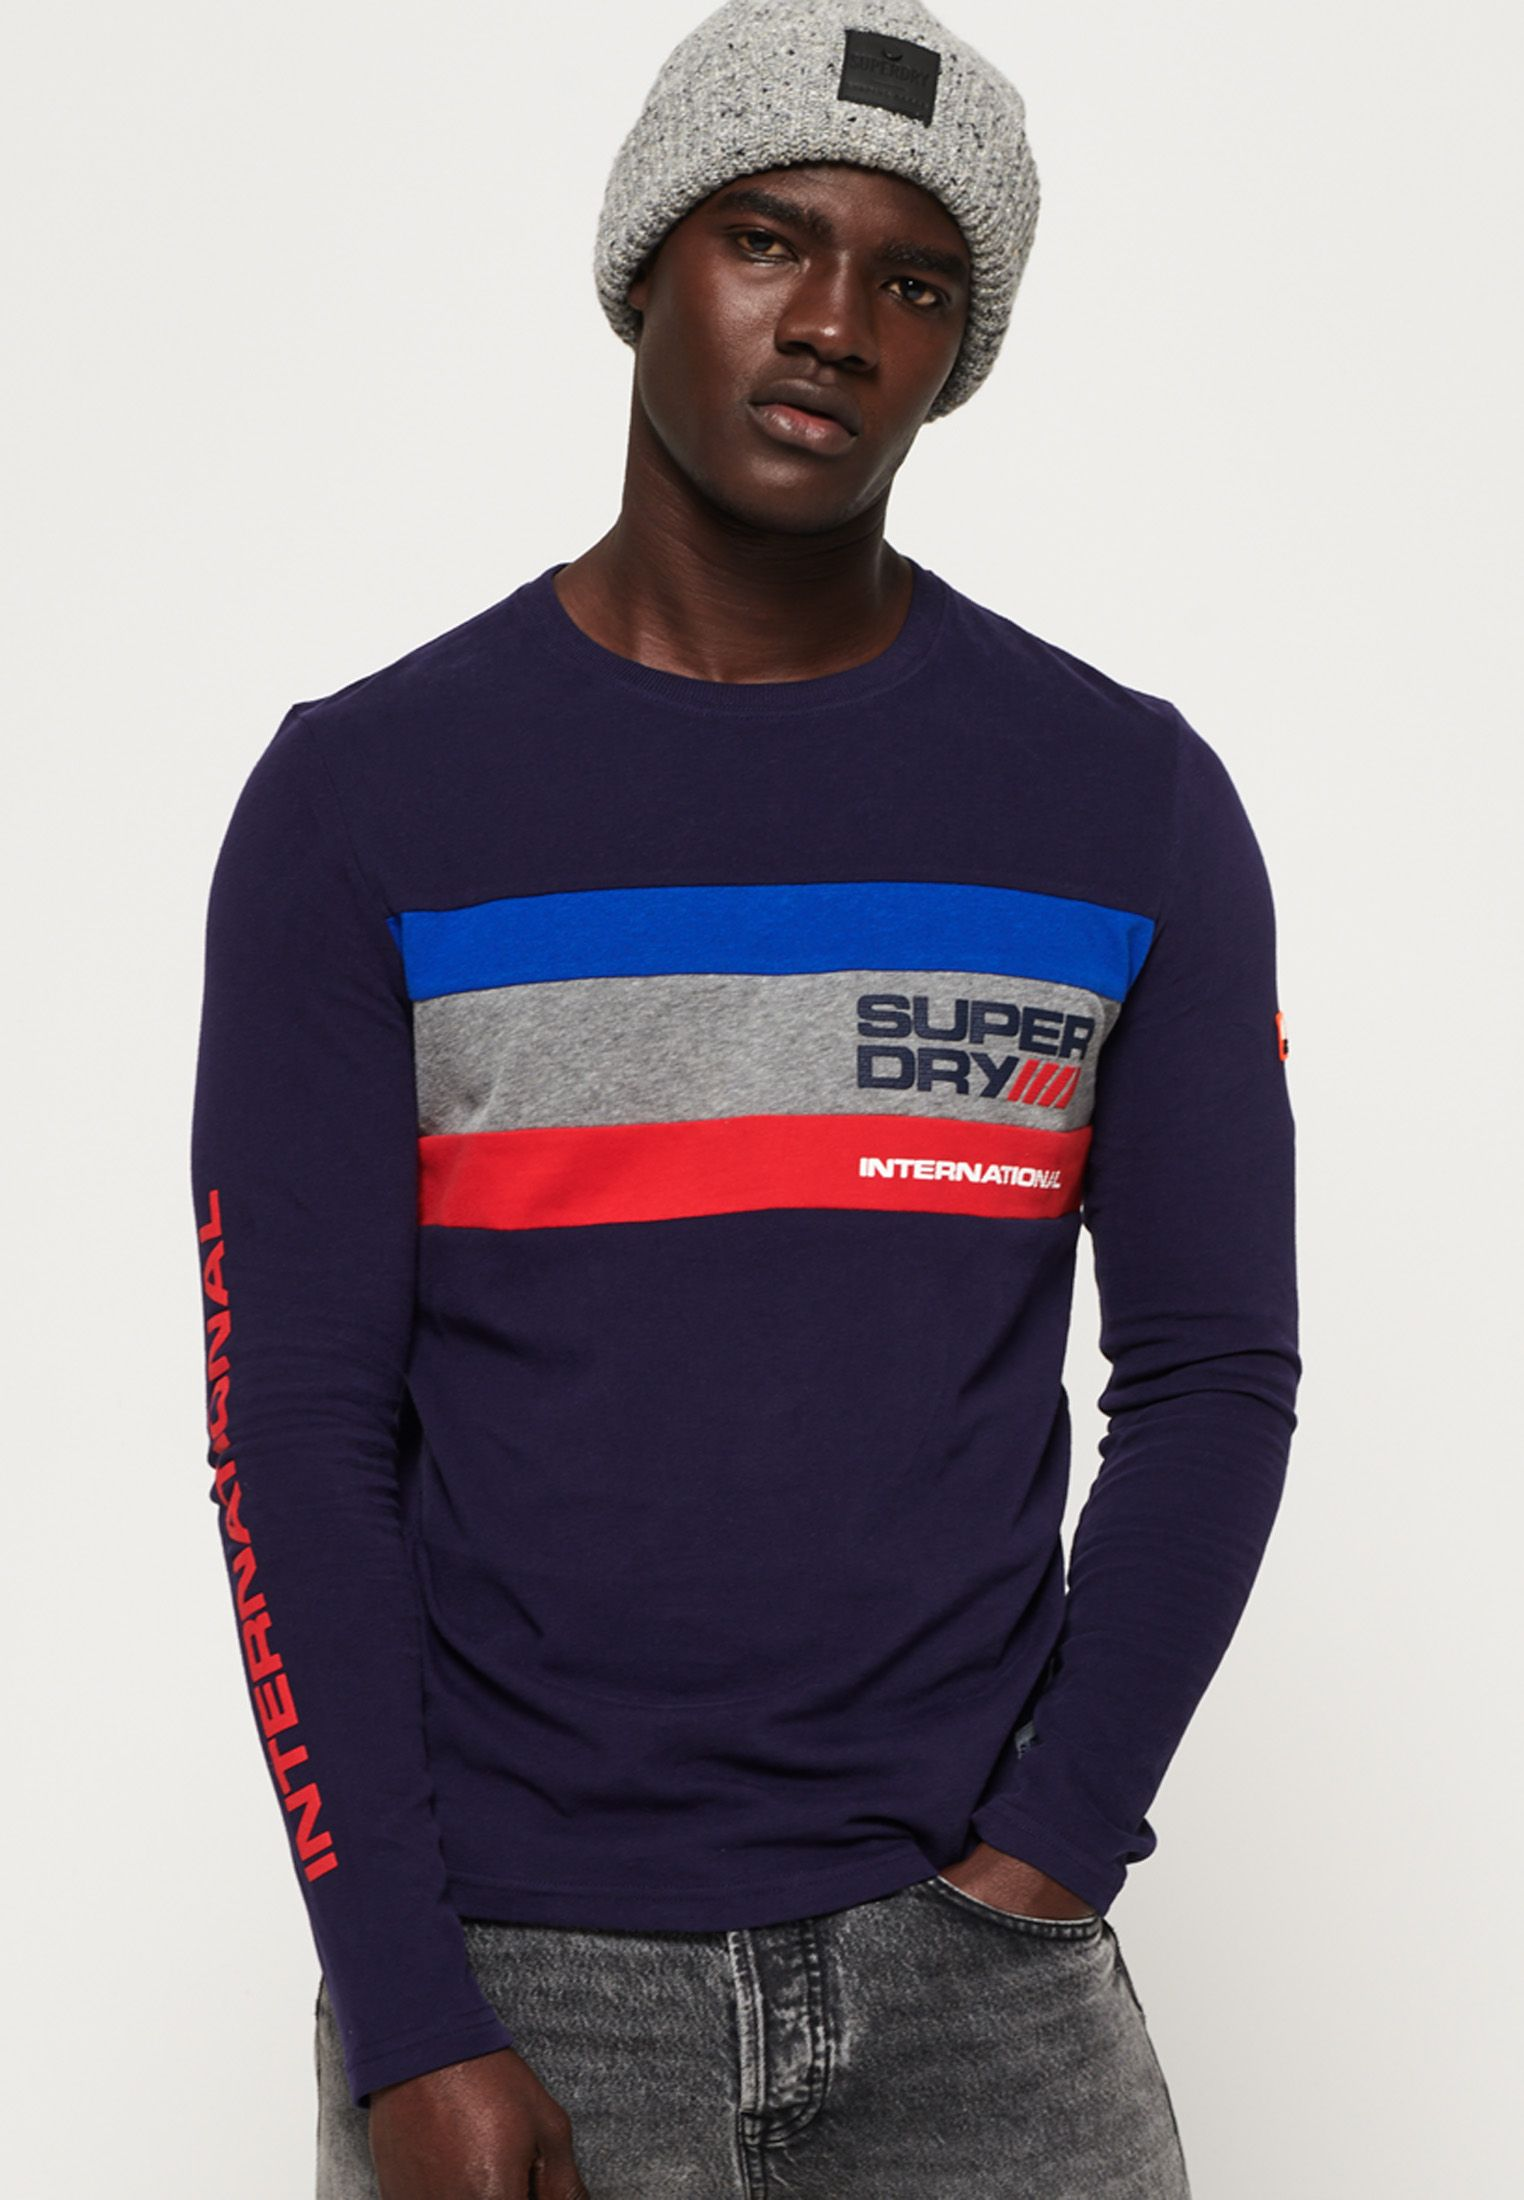 Superdry(極度乾燥しなさい) メンズTシャツ